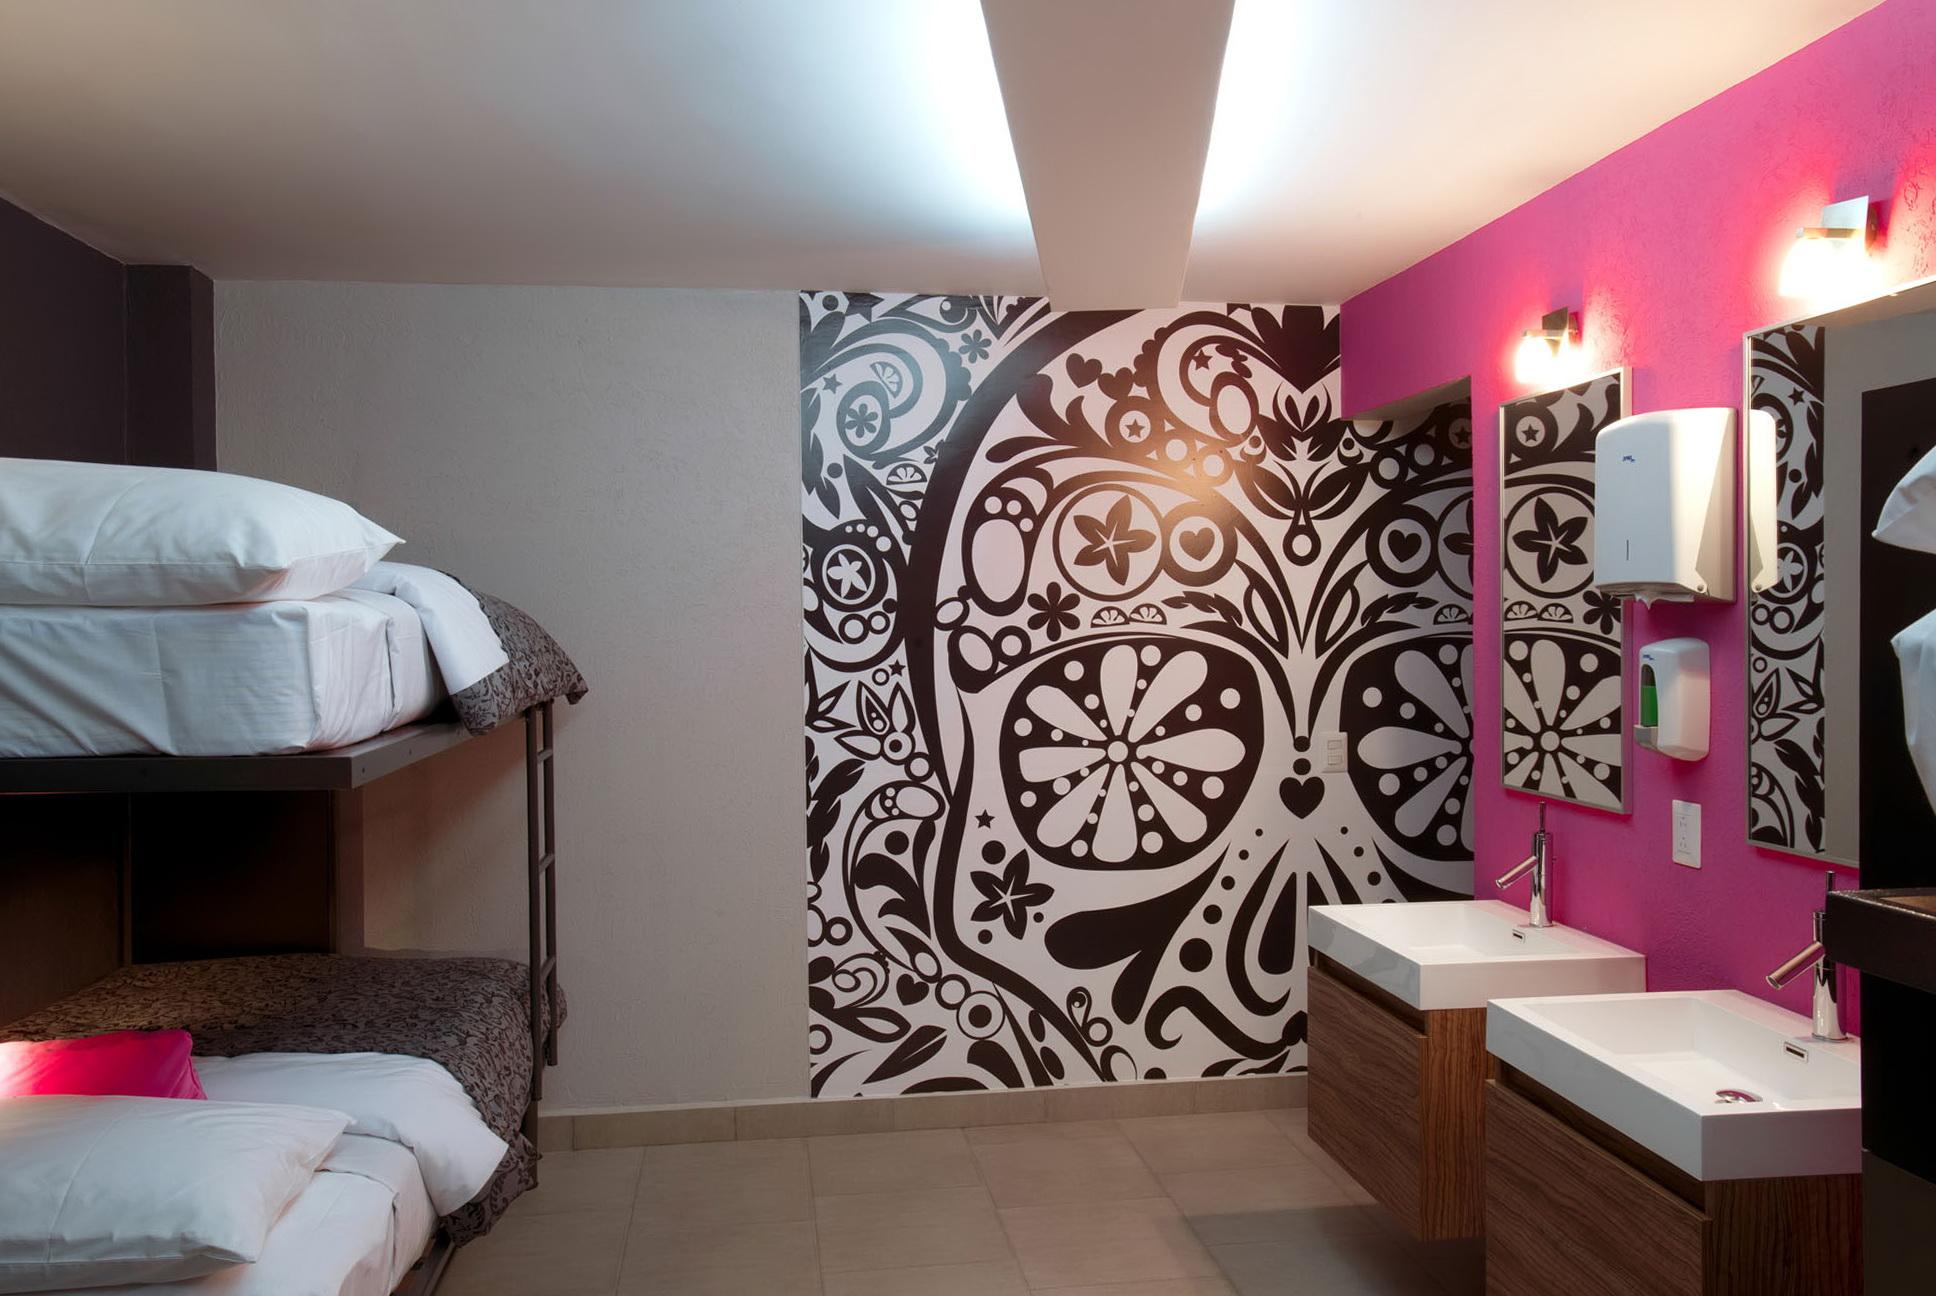 Mexican Wall Art Designs